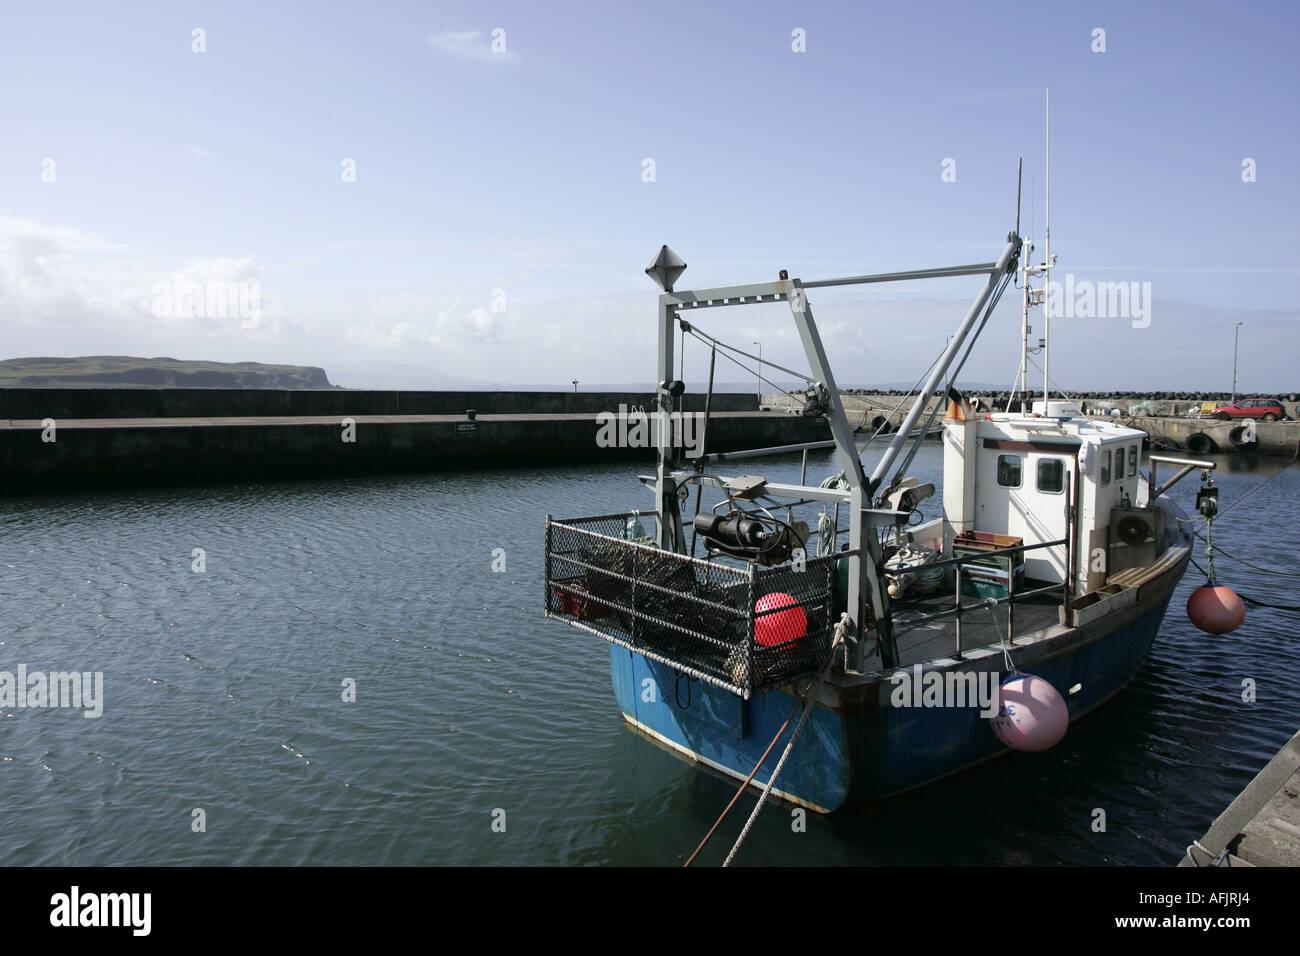 fishing boat tied up in rathlin harbour Rathlin Island northern ireland - Stock Image